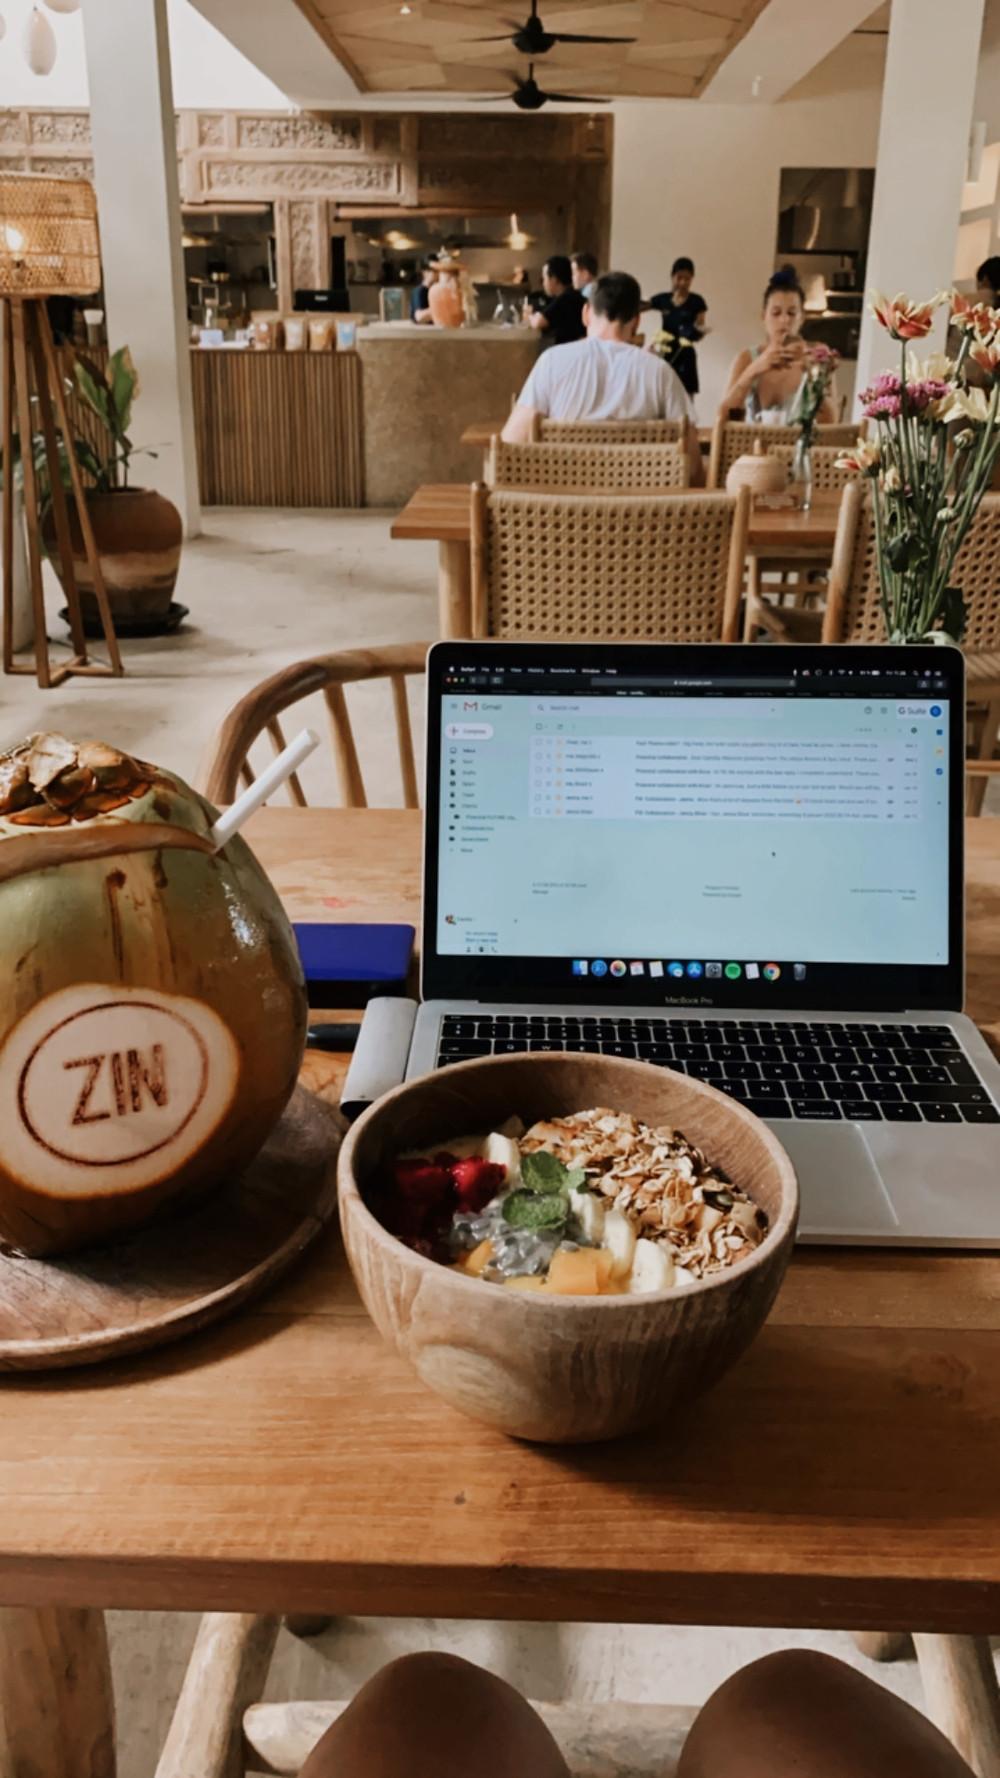 zin cafe Bali digital nomad food computer working in cafe